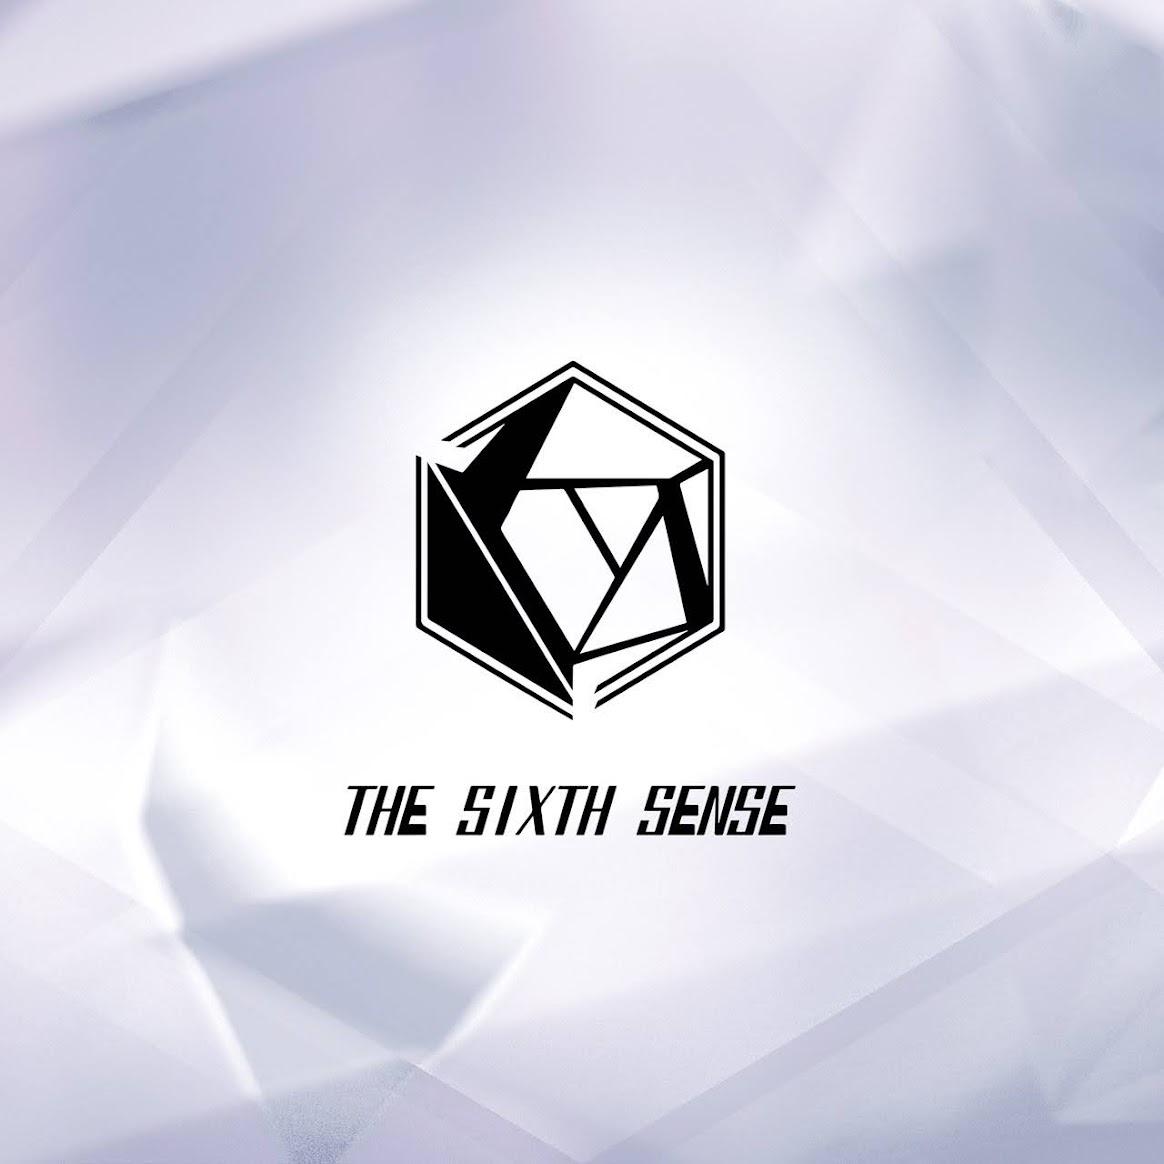 Reol 新作〈第六感〉MV 人氣團體 東京ゲゲゲイ ( Tokyo Gegegay )也來客串!